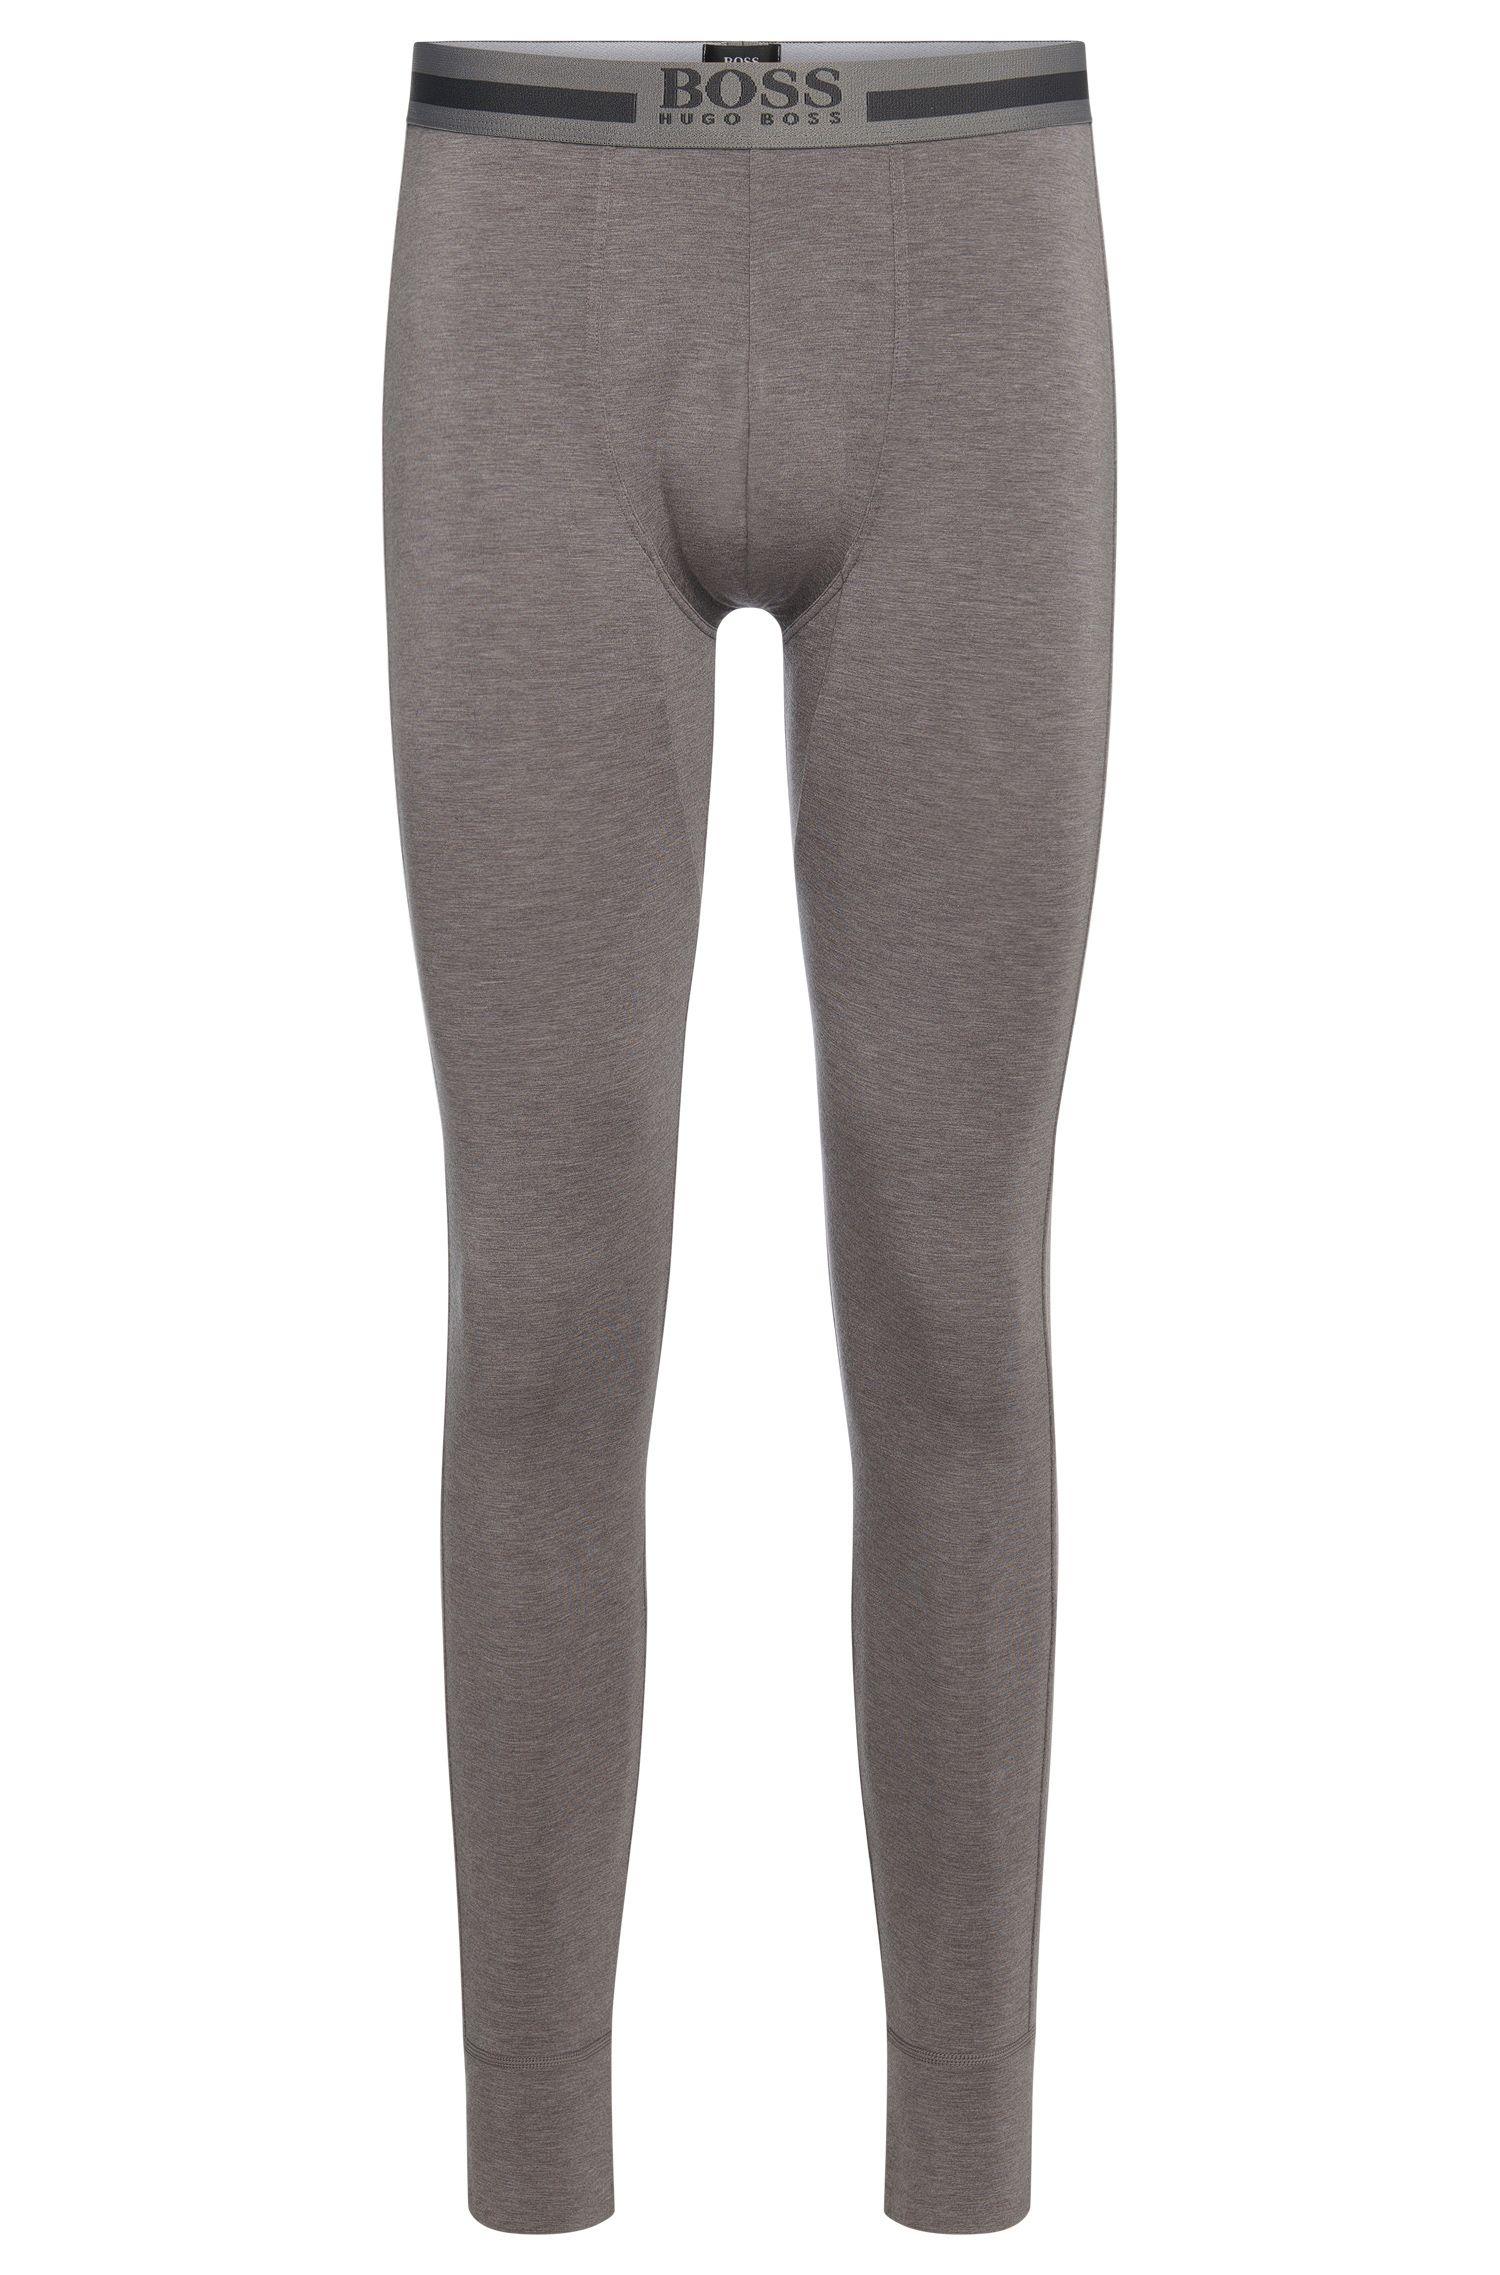 'Long John Thermal' | Stretch Viscose Blend Thermal Leggings